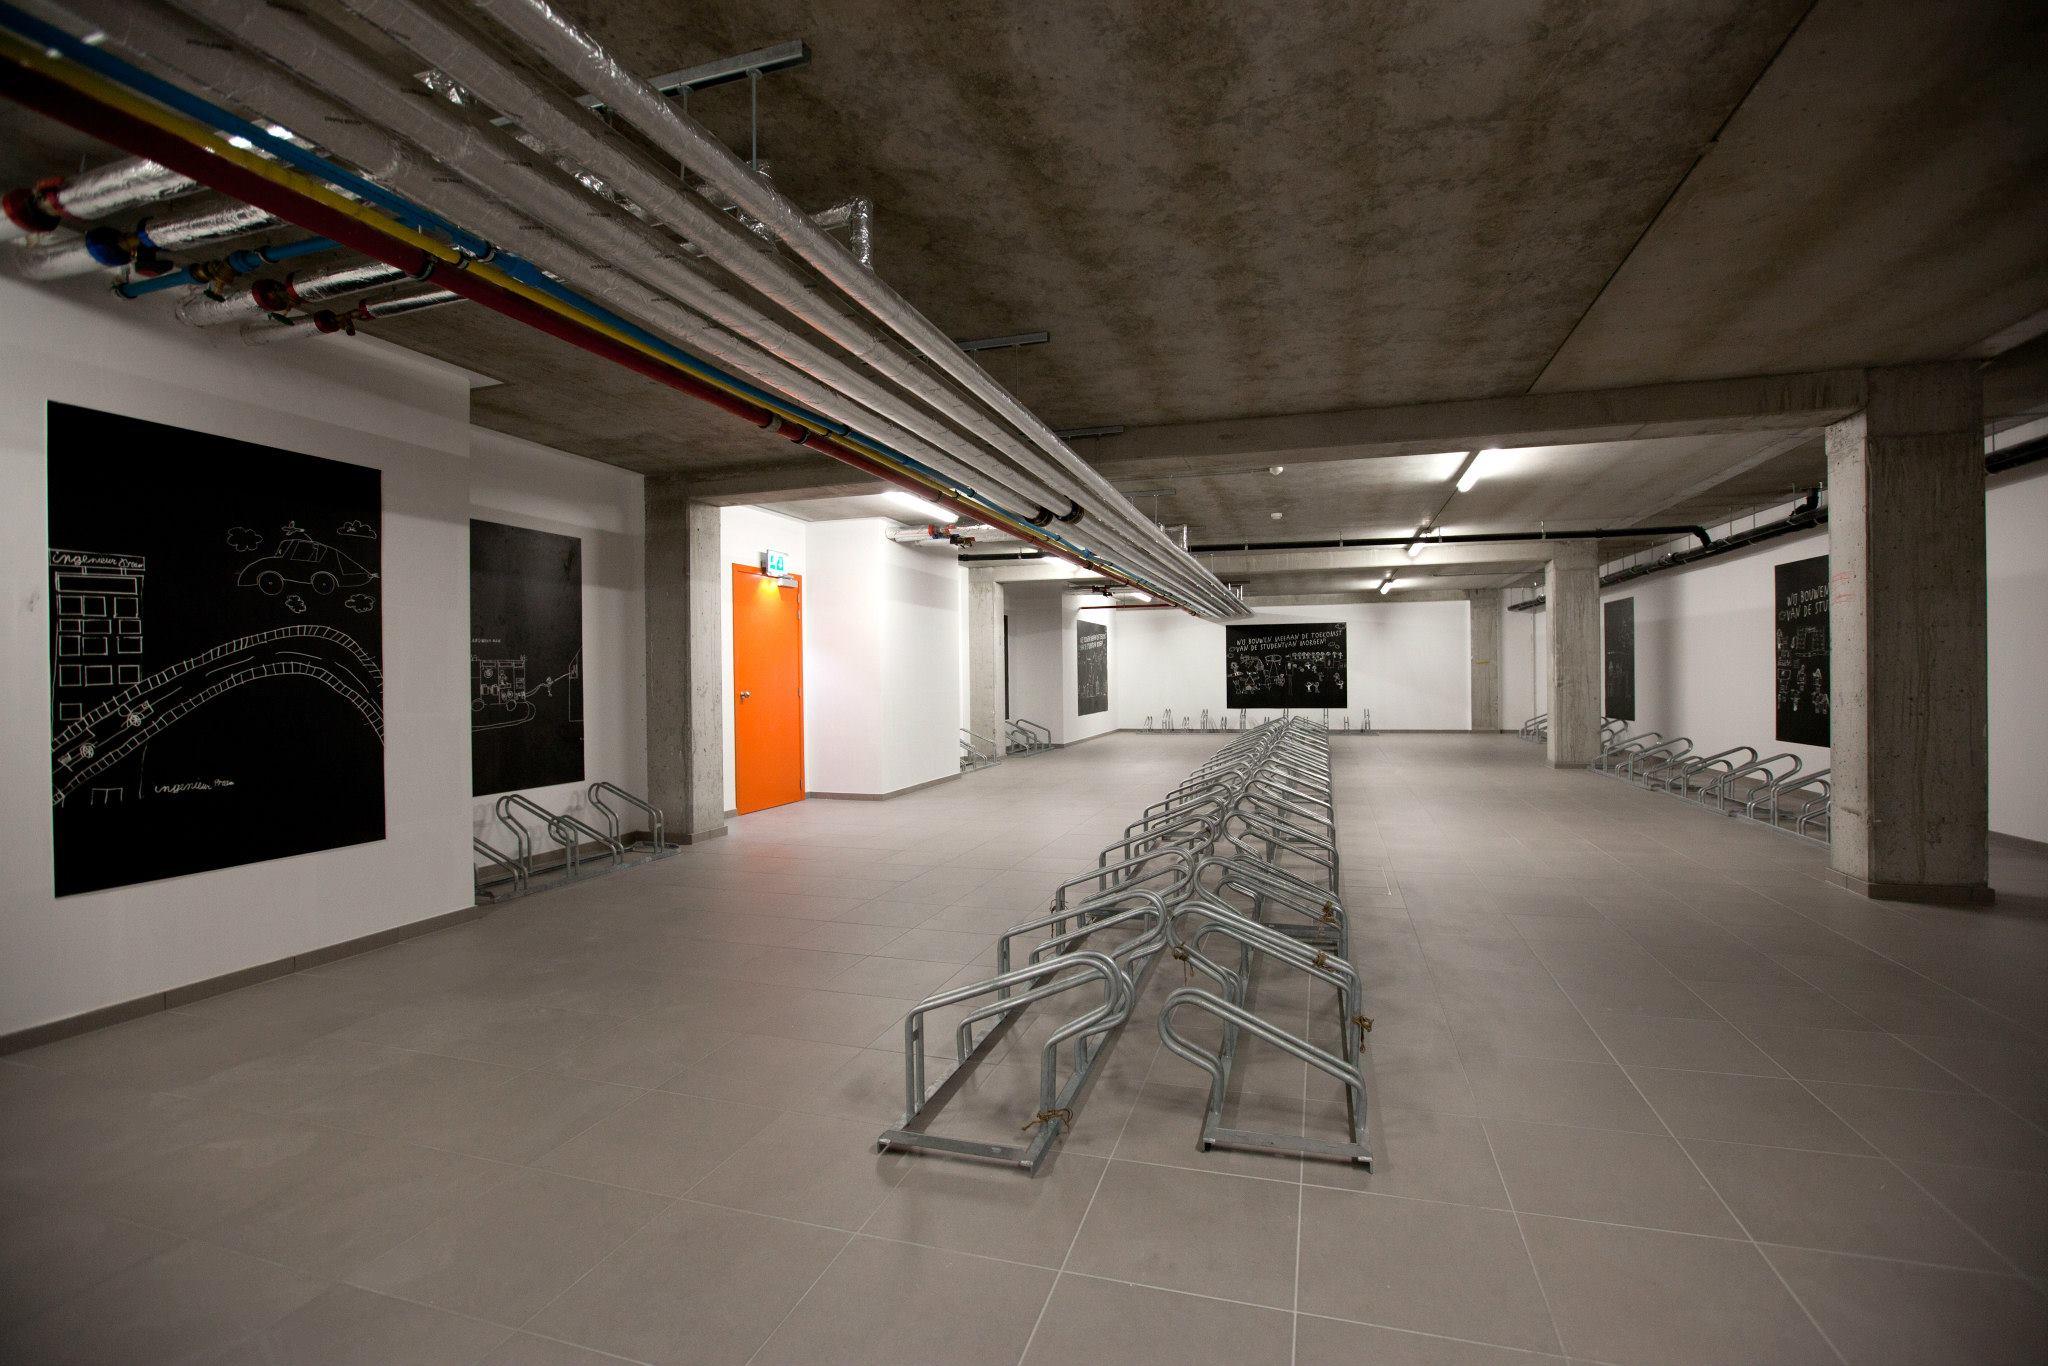 10452894 709638459114031 8518799981856056531 o 709638459114031 | Baeyens & Beck architecten Gent | architect nieuwbouw renovatie interieur | high end | architectenbureau